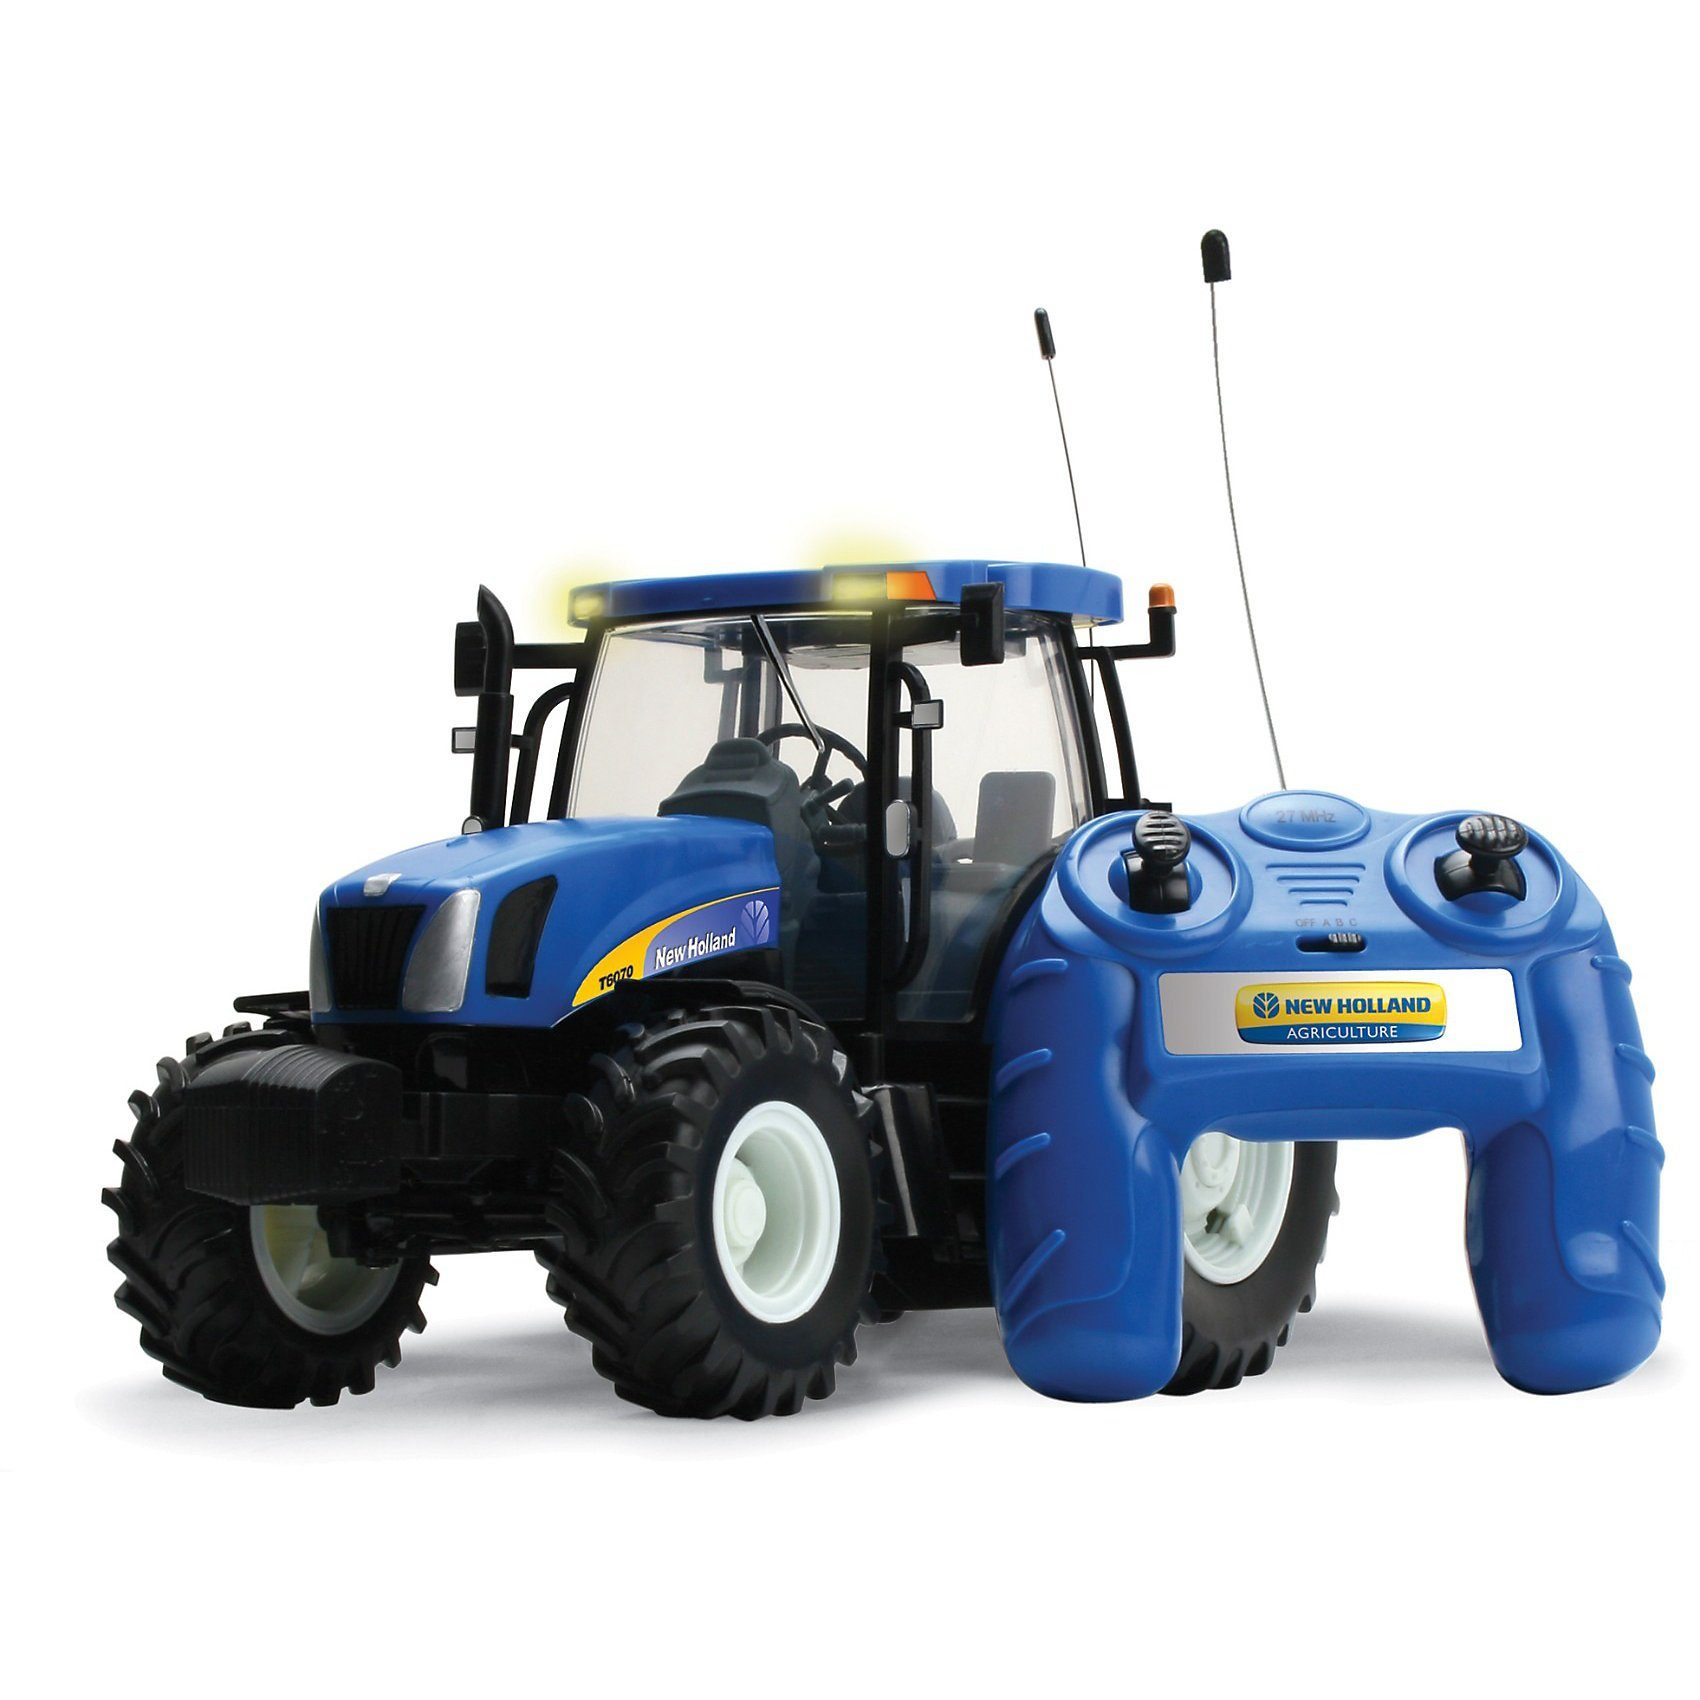 TOMY Britains - New Holland RC-Traktor T6070 1:16